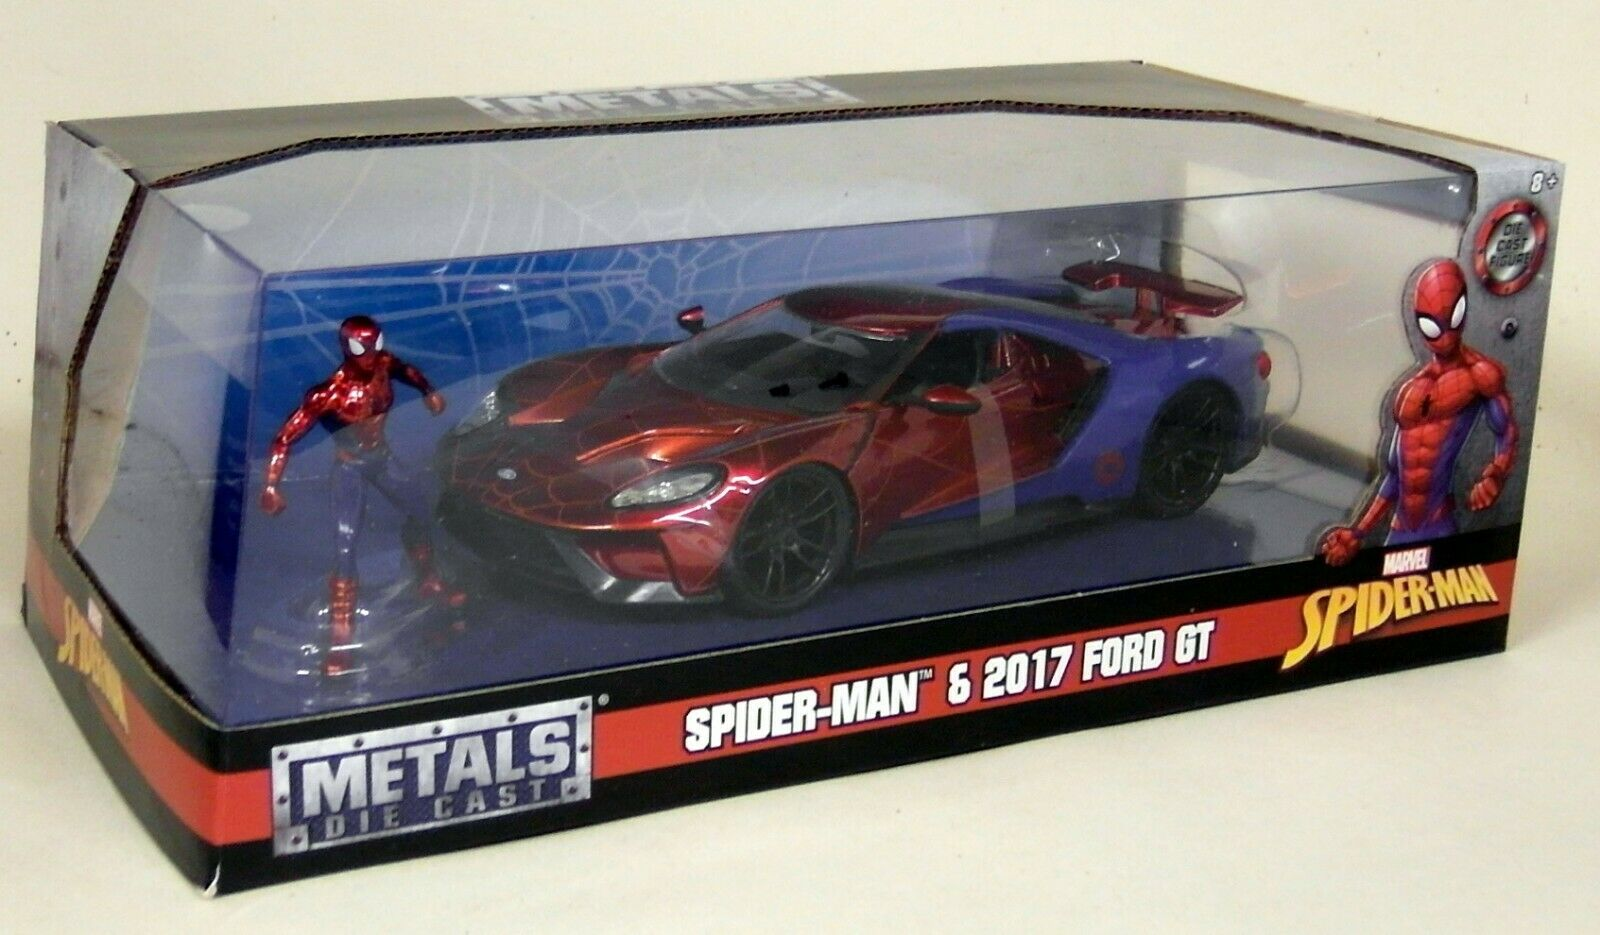 Jada 1 24 scale-Marvel Spiderman Figure  2017 Ford GT Diecast Voiture Modèle